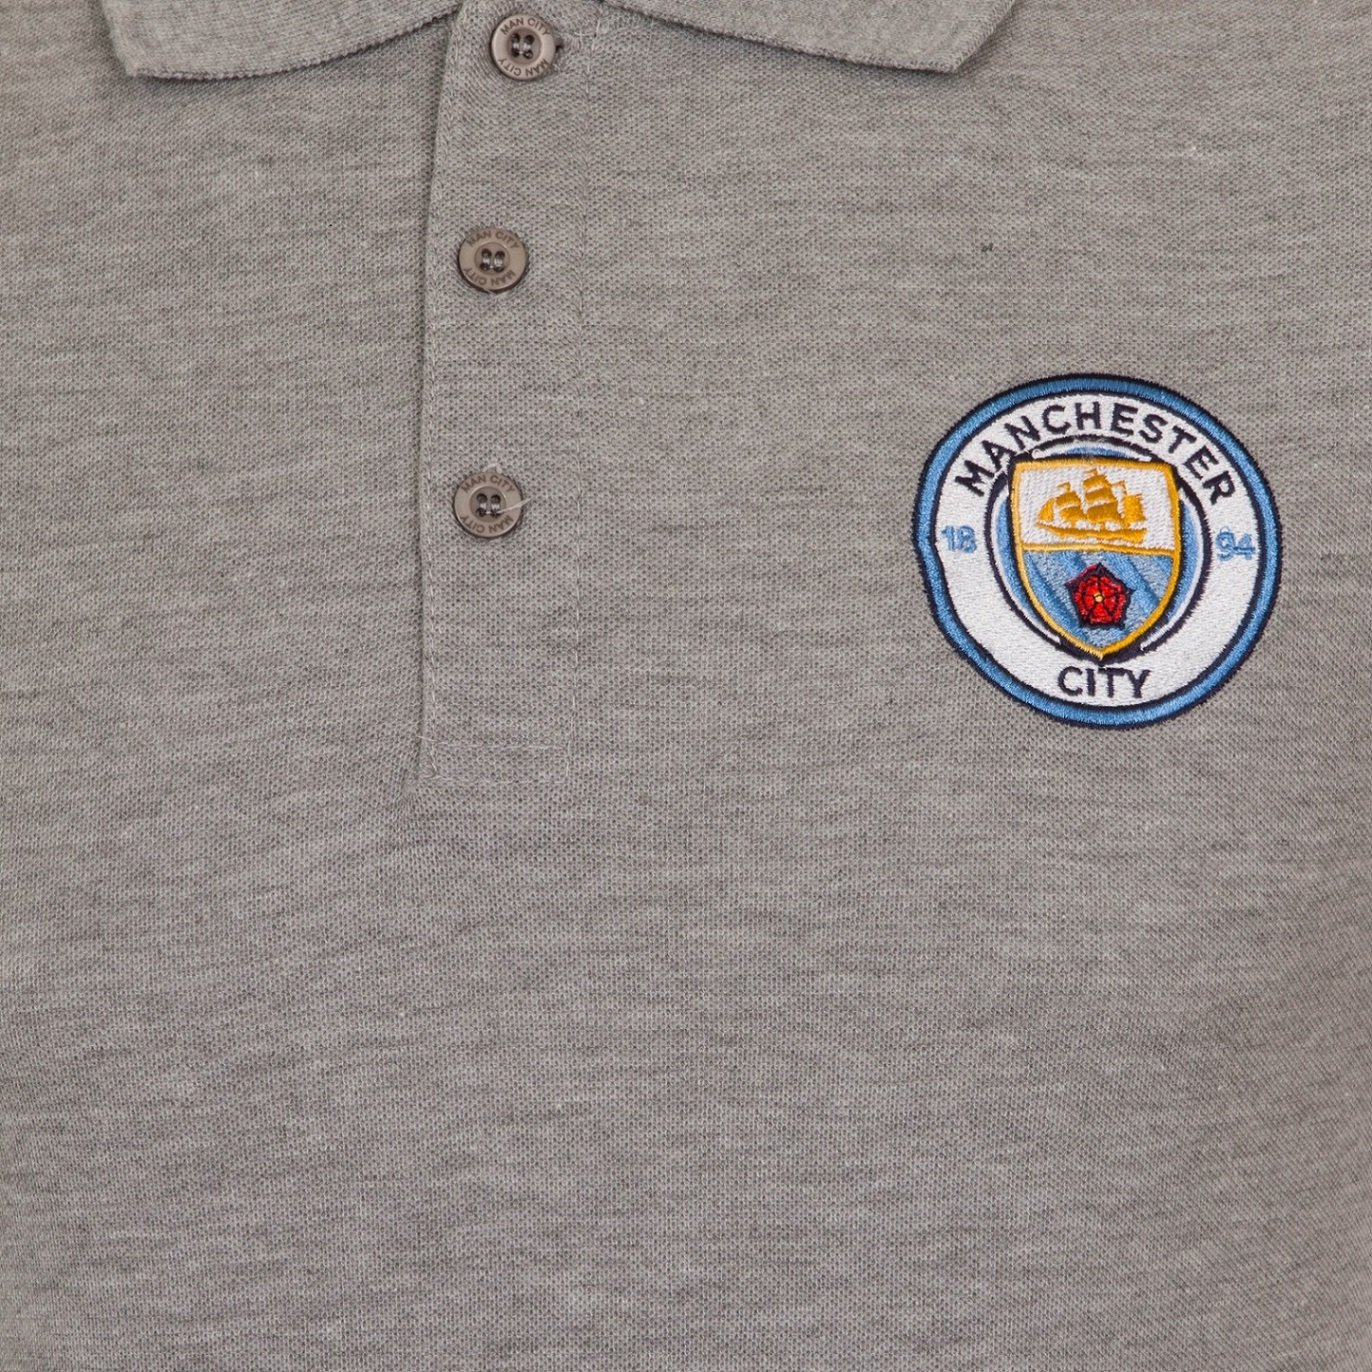 Manchester City Football Club Official Football Gift Boys Crest Polo Shirt